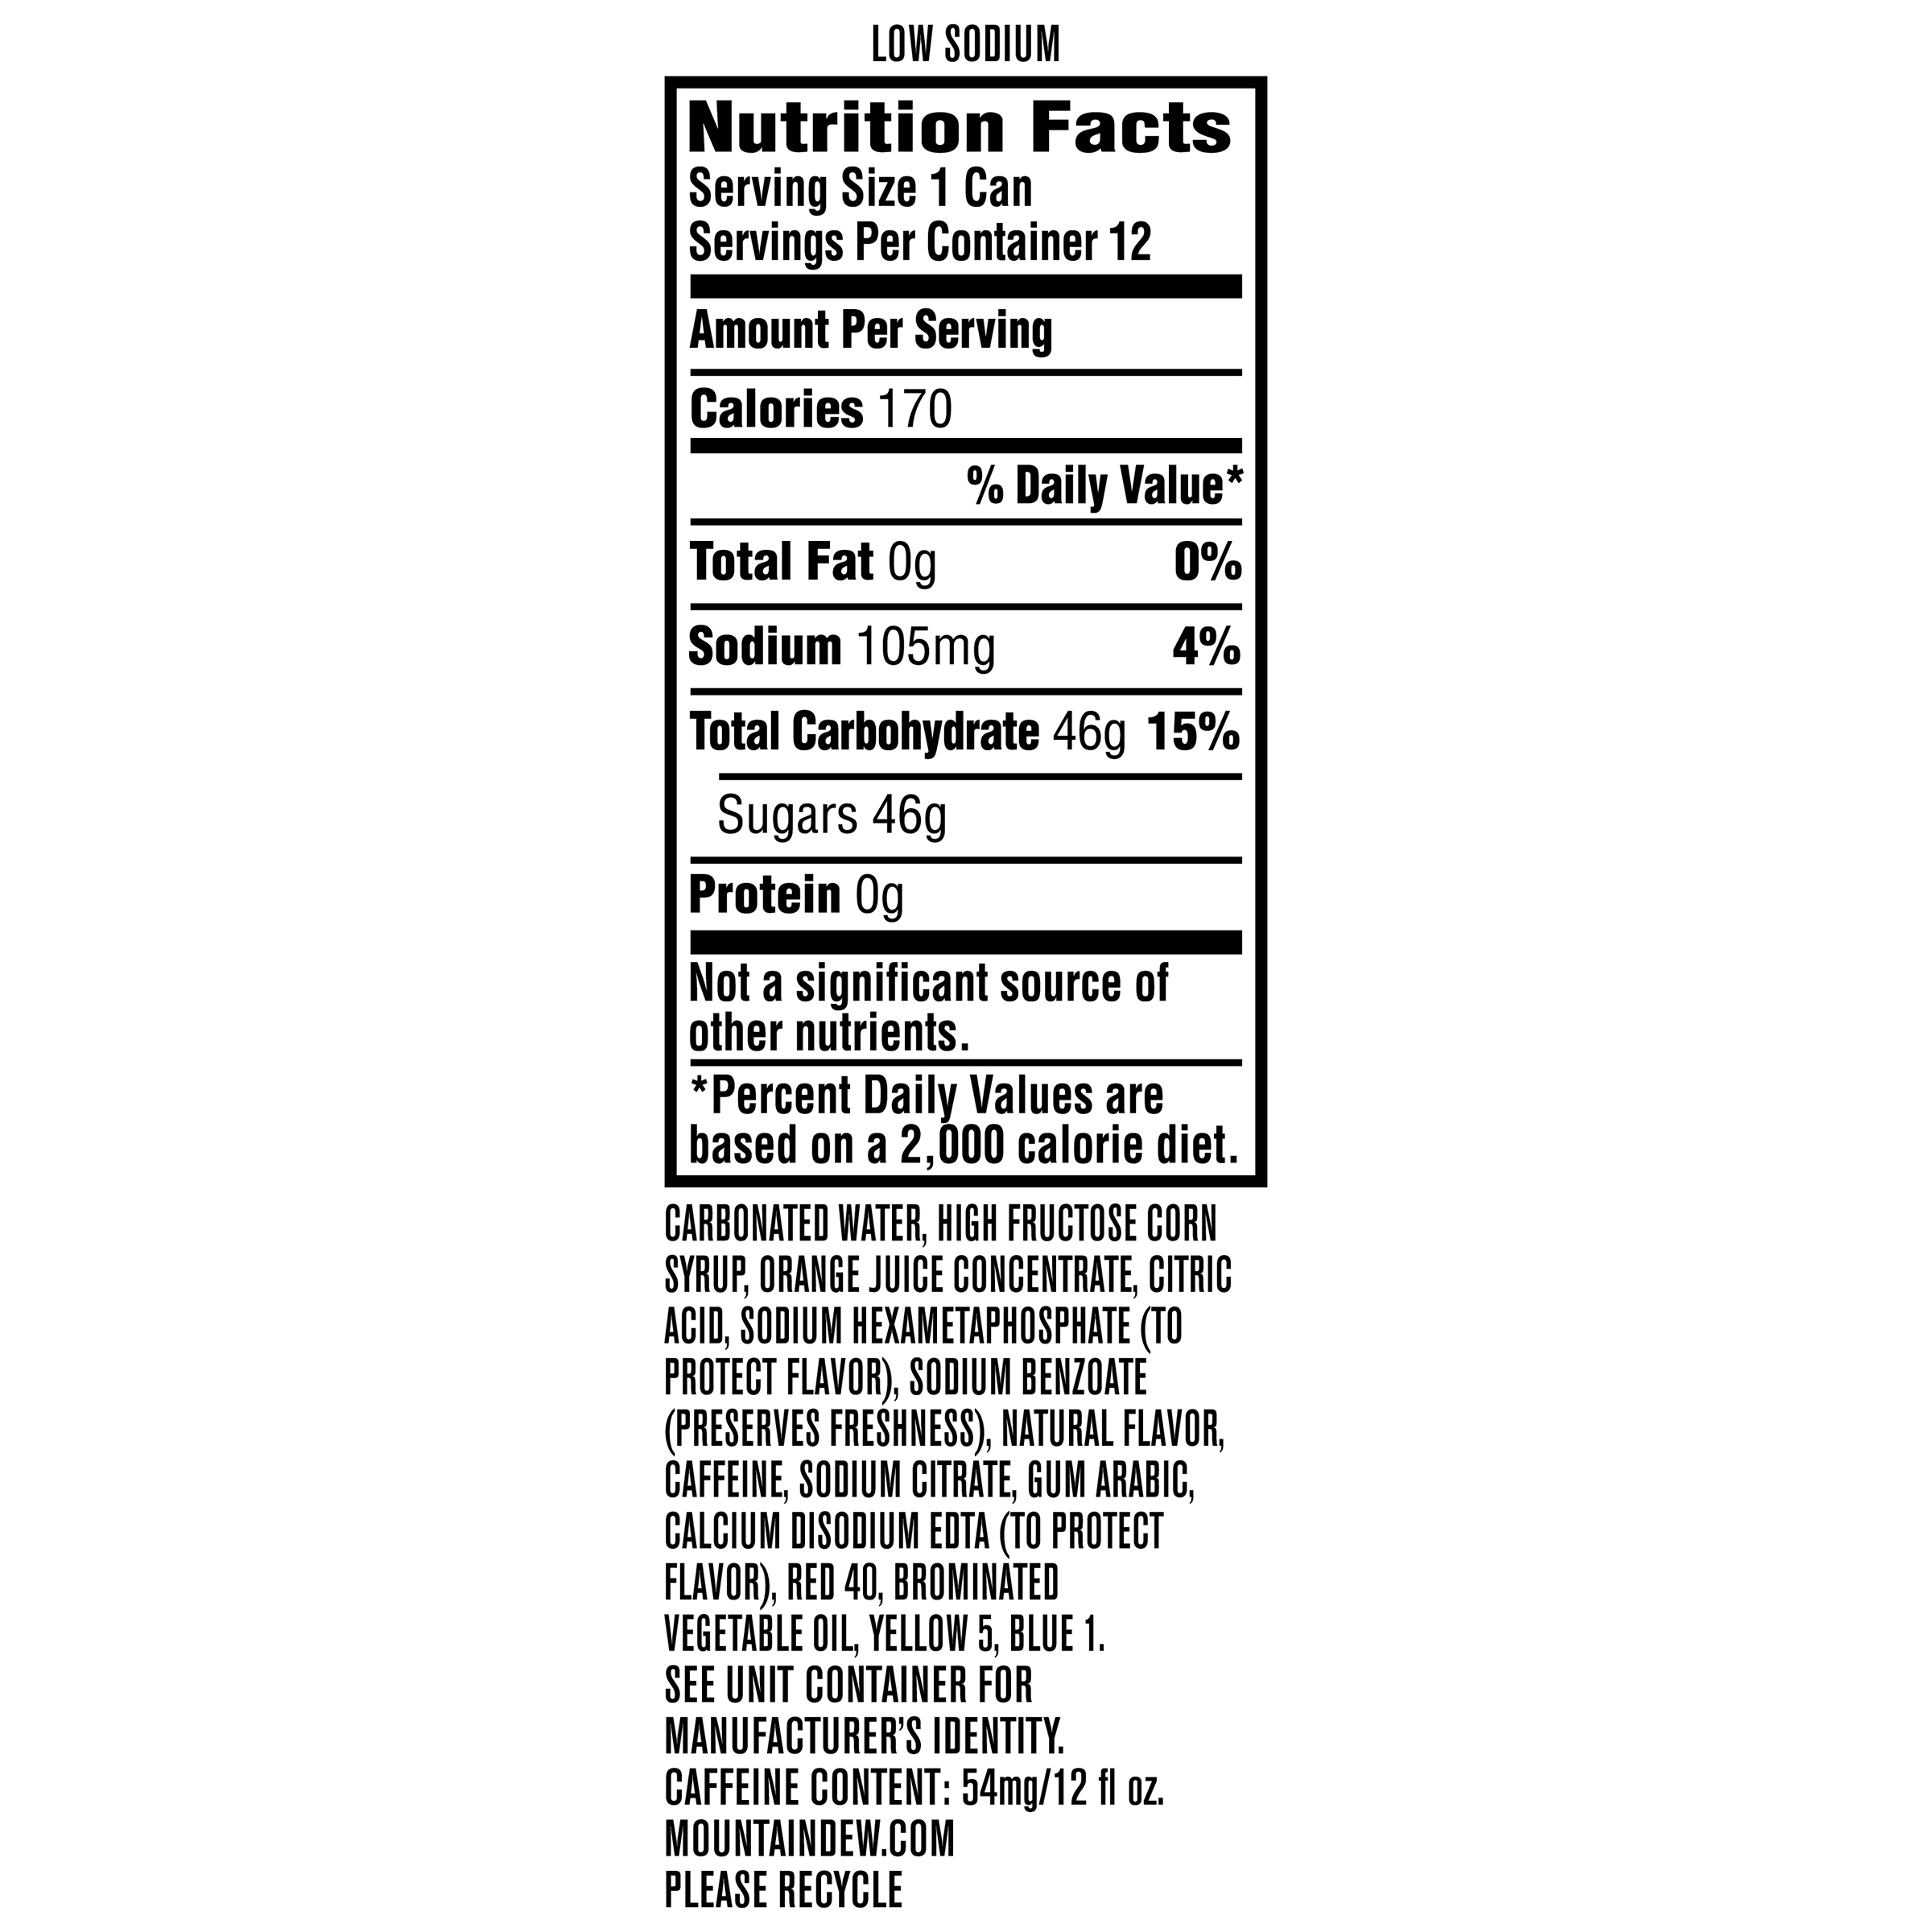 Mountain Dew Code Red Soda 12 Fl Oz 12 Count Walmart Com